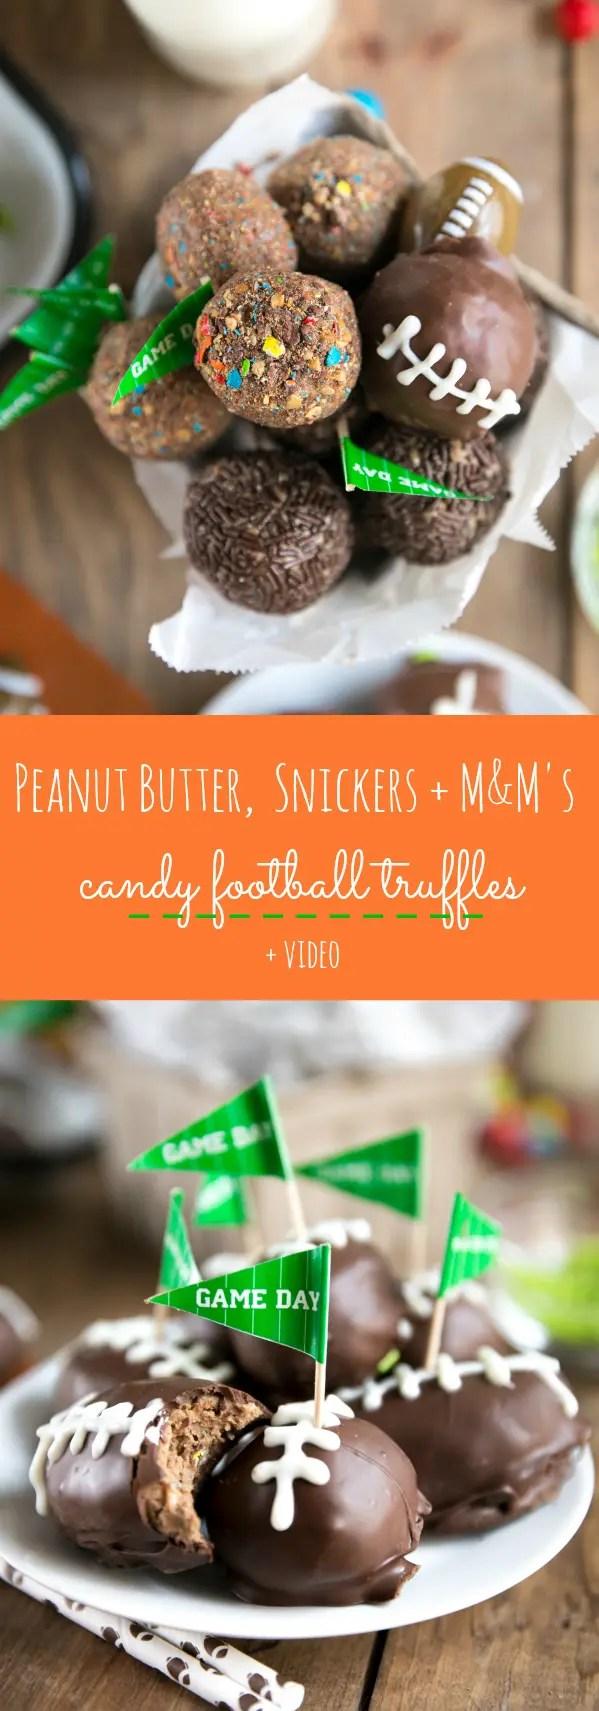 Peanut Butter Snickers and M&M\'s Candy Truffles (+Video) #sponsored #football #treats #snacks #chocolate #peanutbutter #truffles #dessert via @theforkedspoon